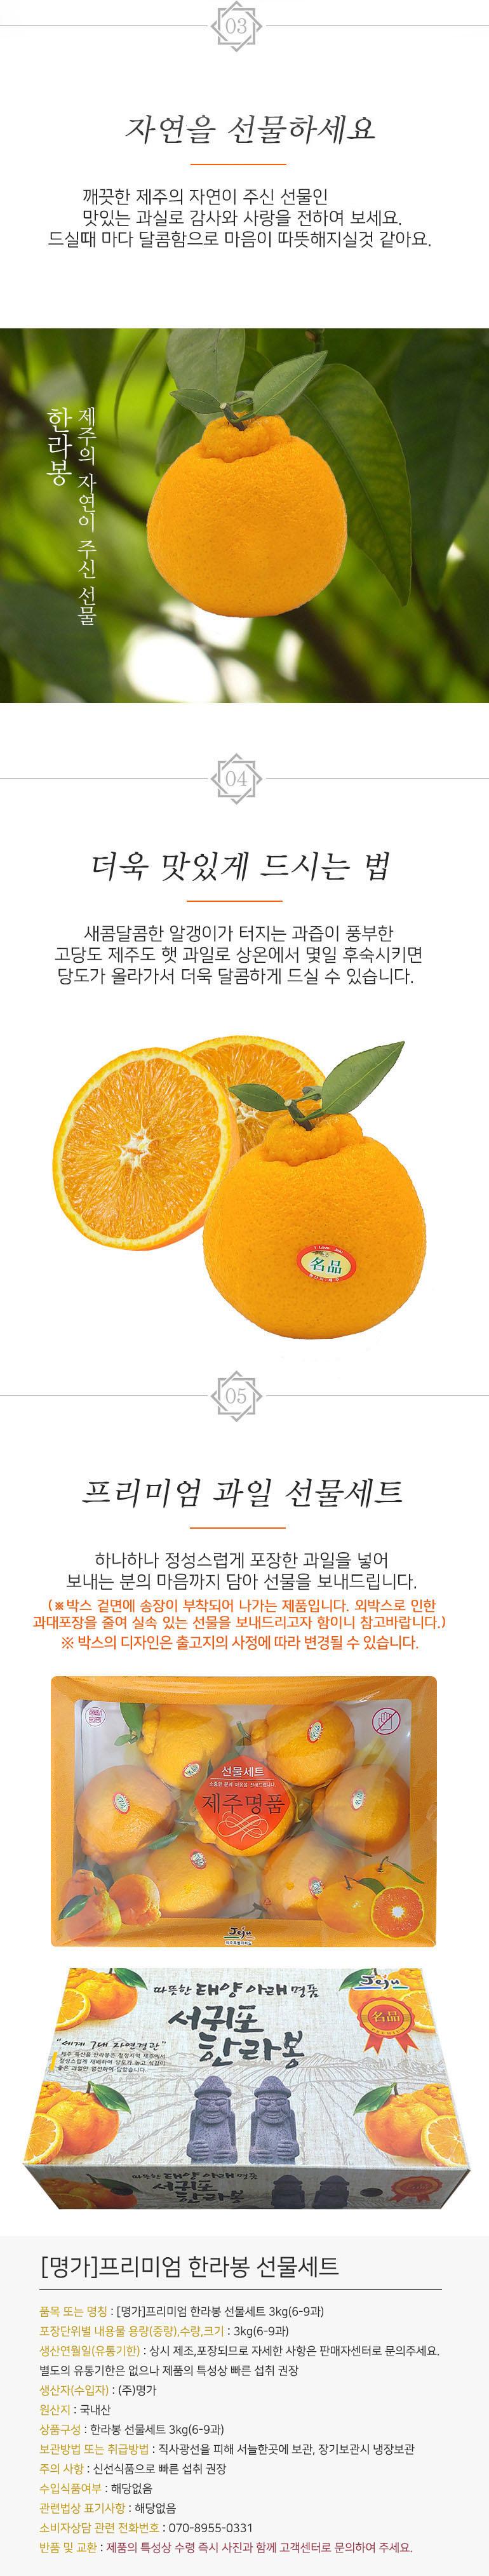 hanlabong_01_02.jpg